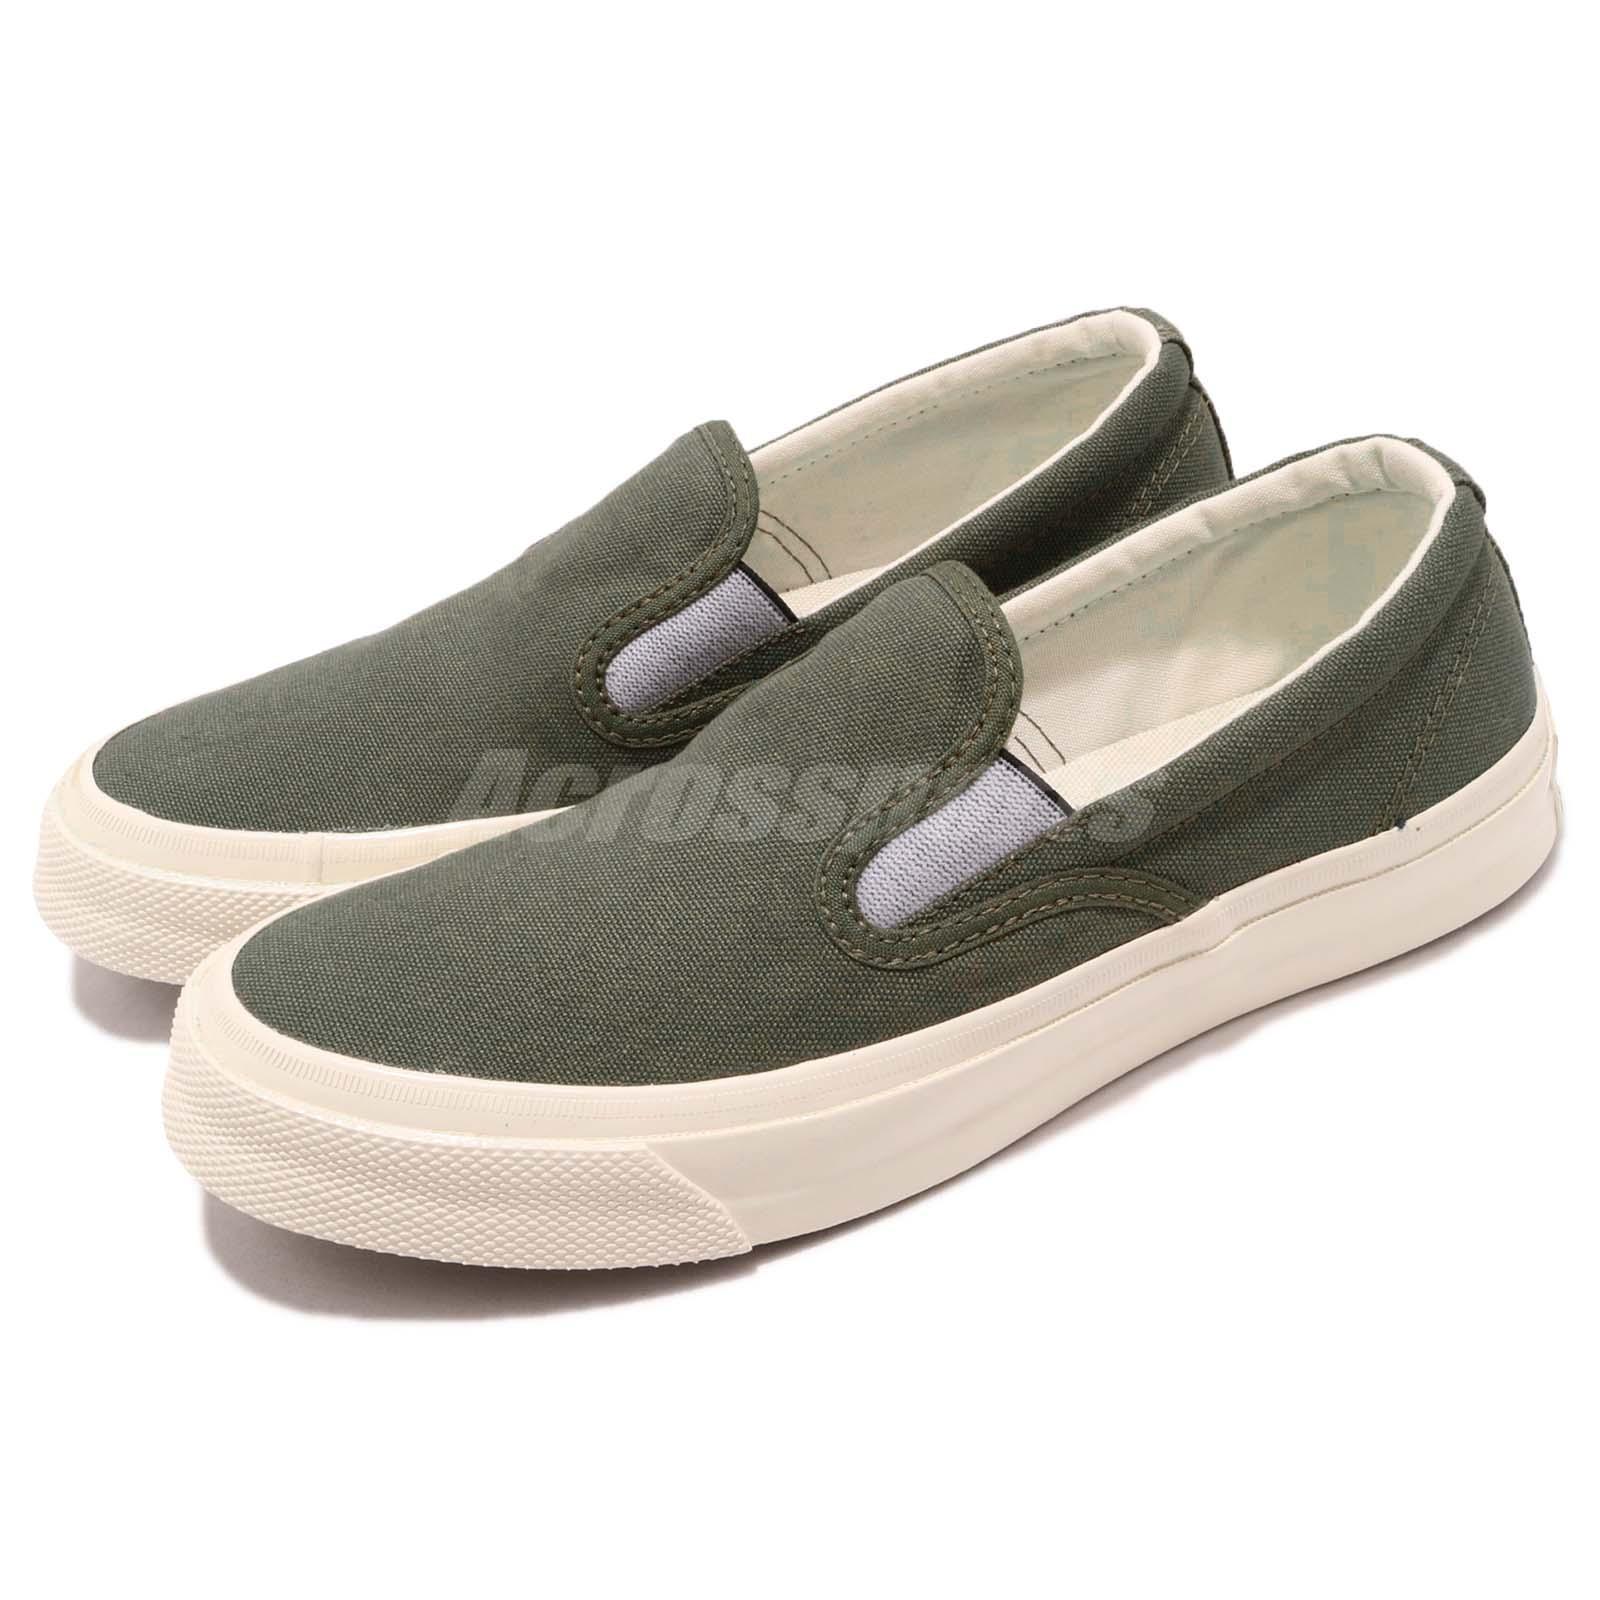 9bfbc51cdb23 Details about Converse Chuck Taylor All Star DeckStar Olive Green Men Slip  On Shoes 162159C